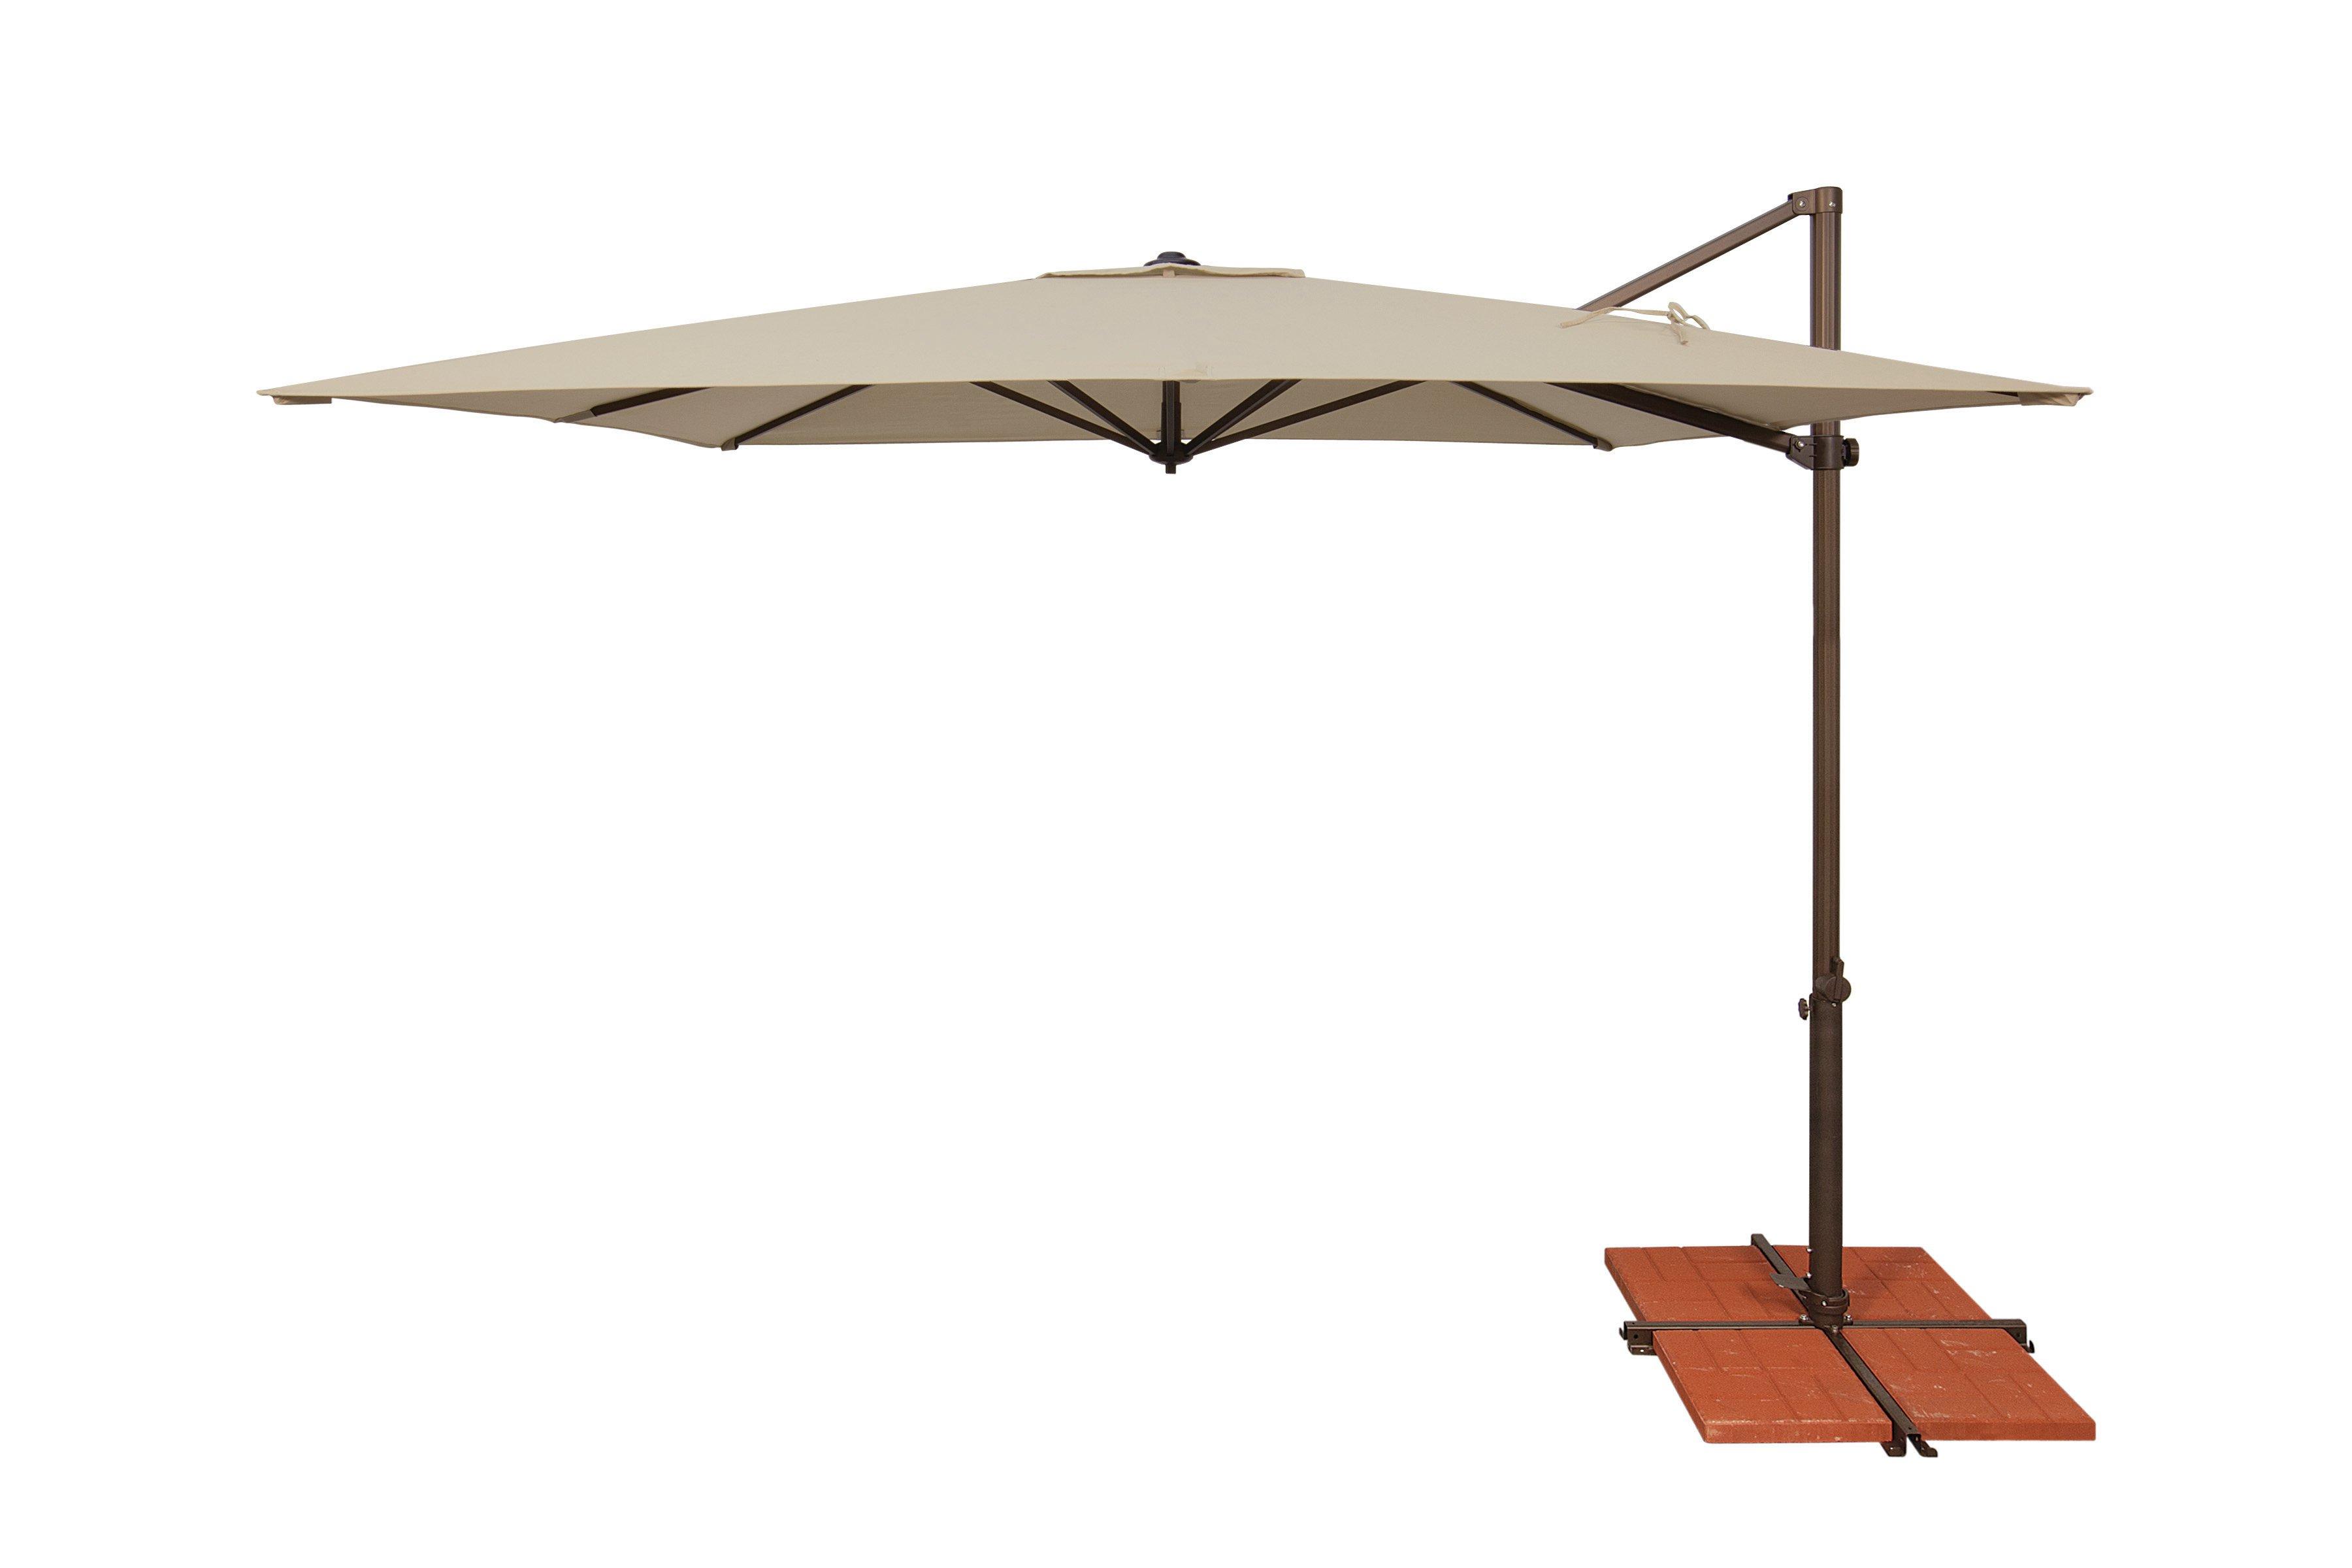 Bondi Square Cantilever Umbrellas For Most Popular Cora 8.6' Square Cantilever Umbrella (Gallery 3 of 20)